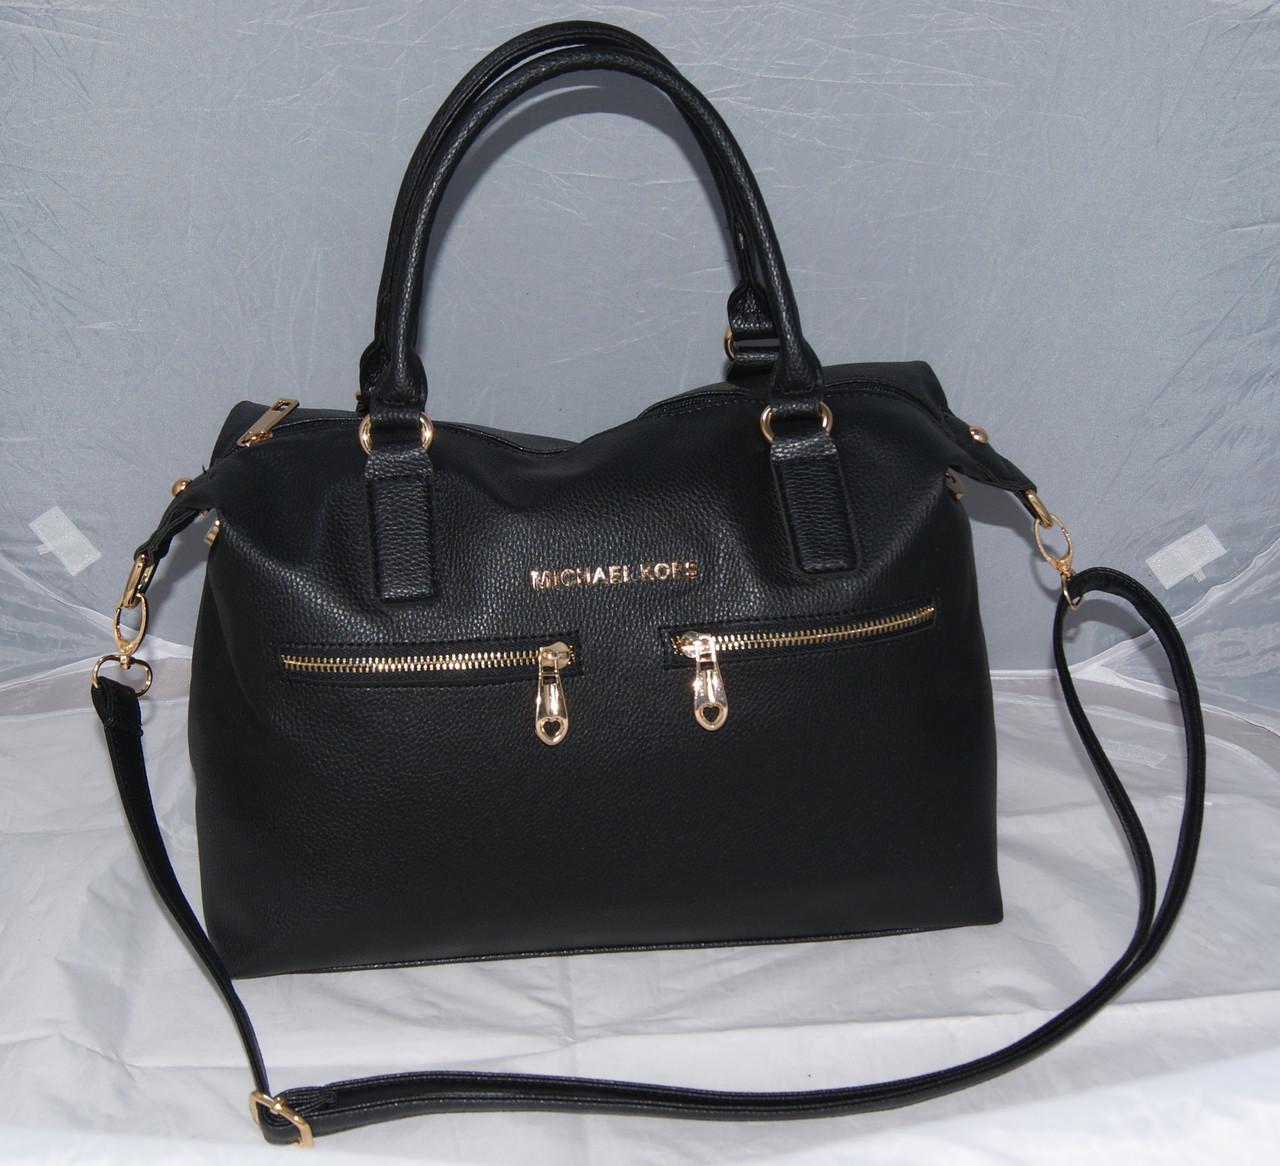 Черная женская сумка Mісhаеl Коrs, в стиле Майкл Корс, MK ( код: IBG046B )